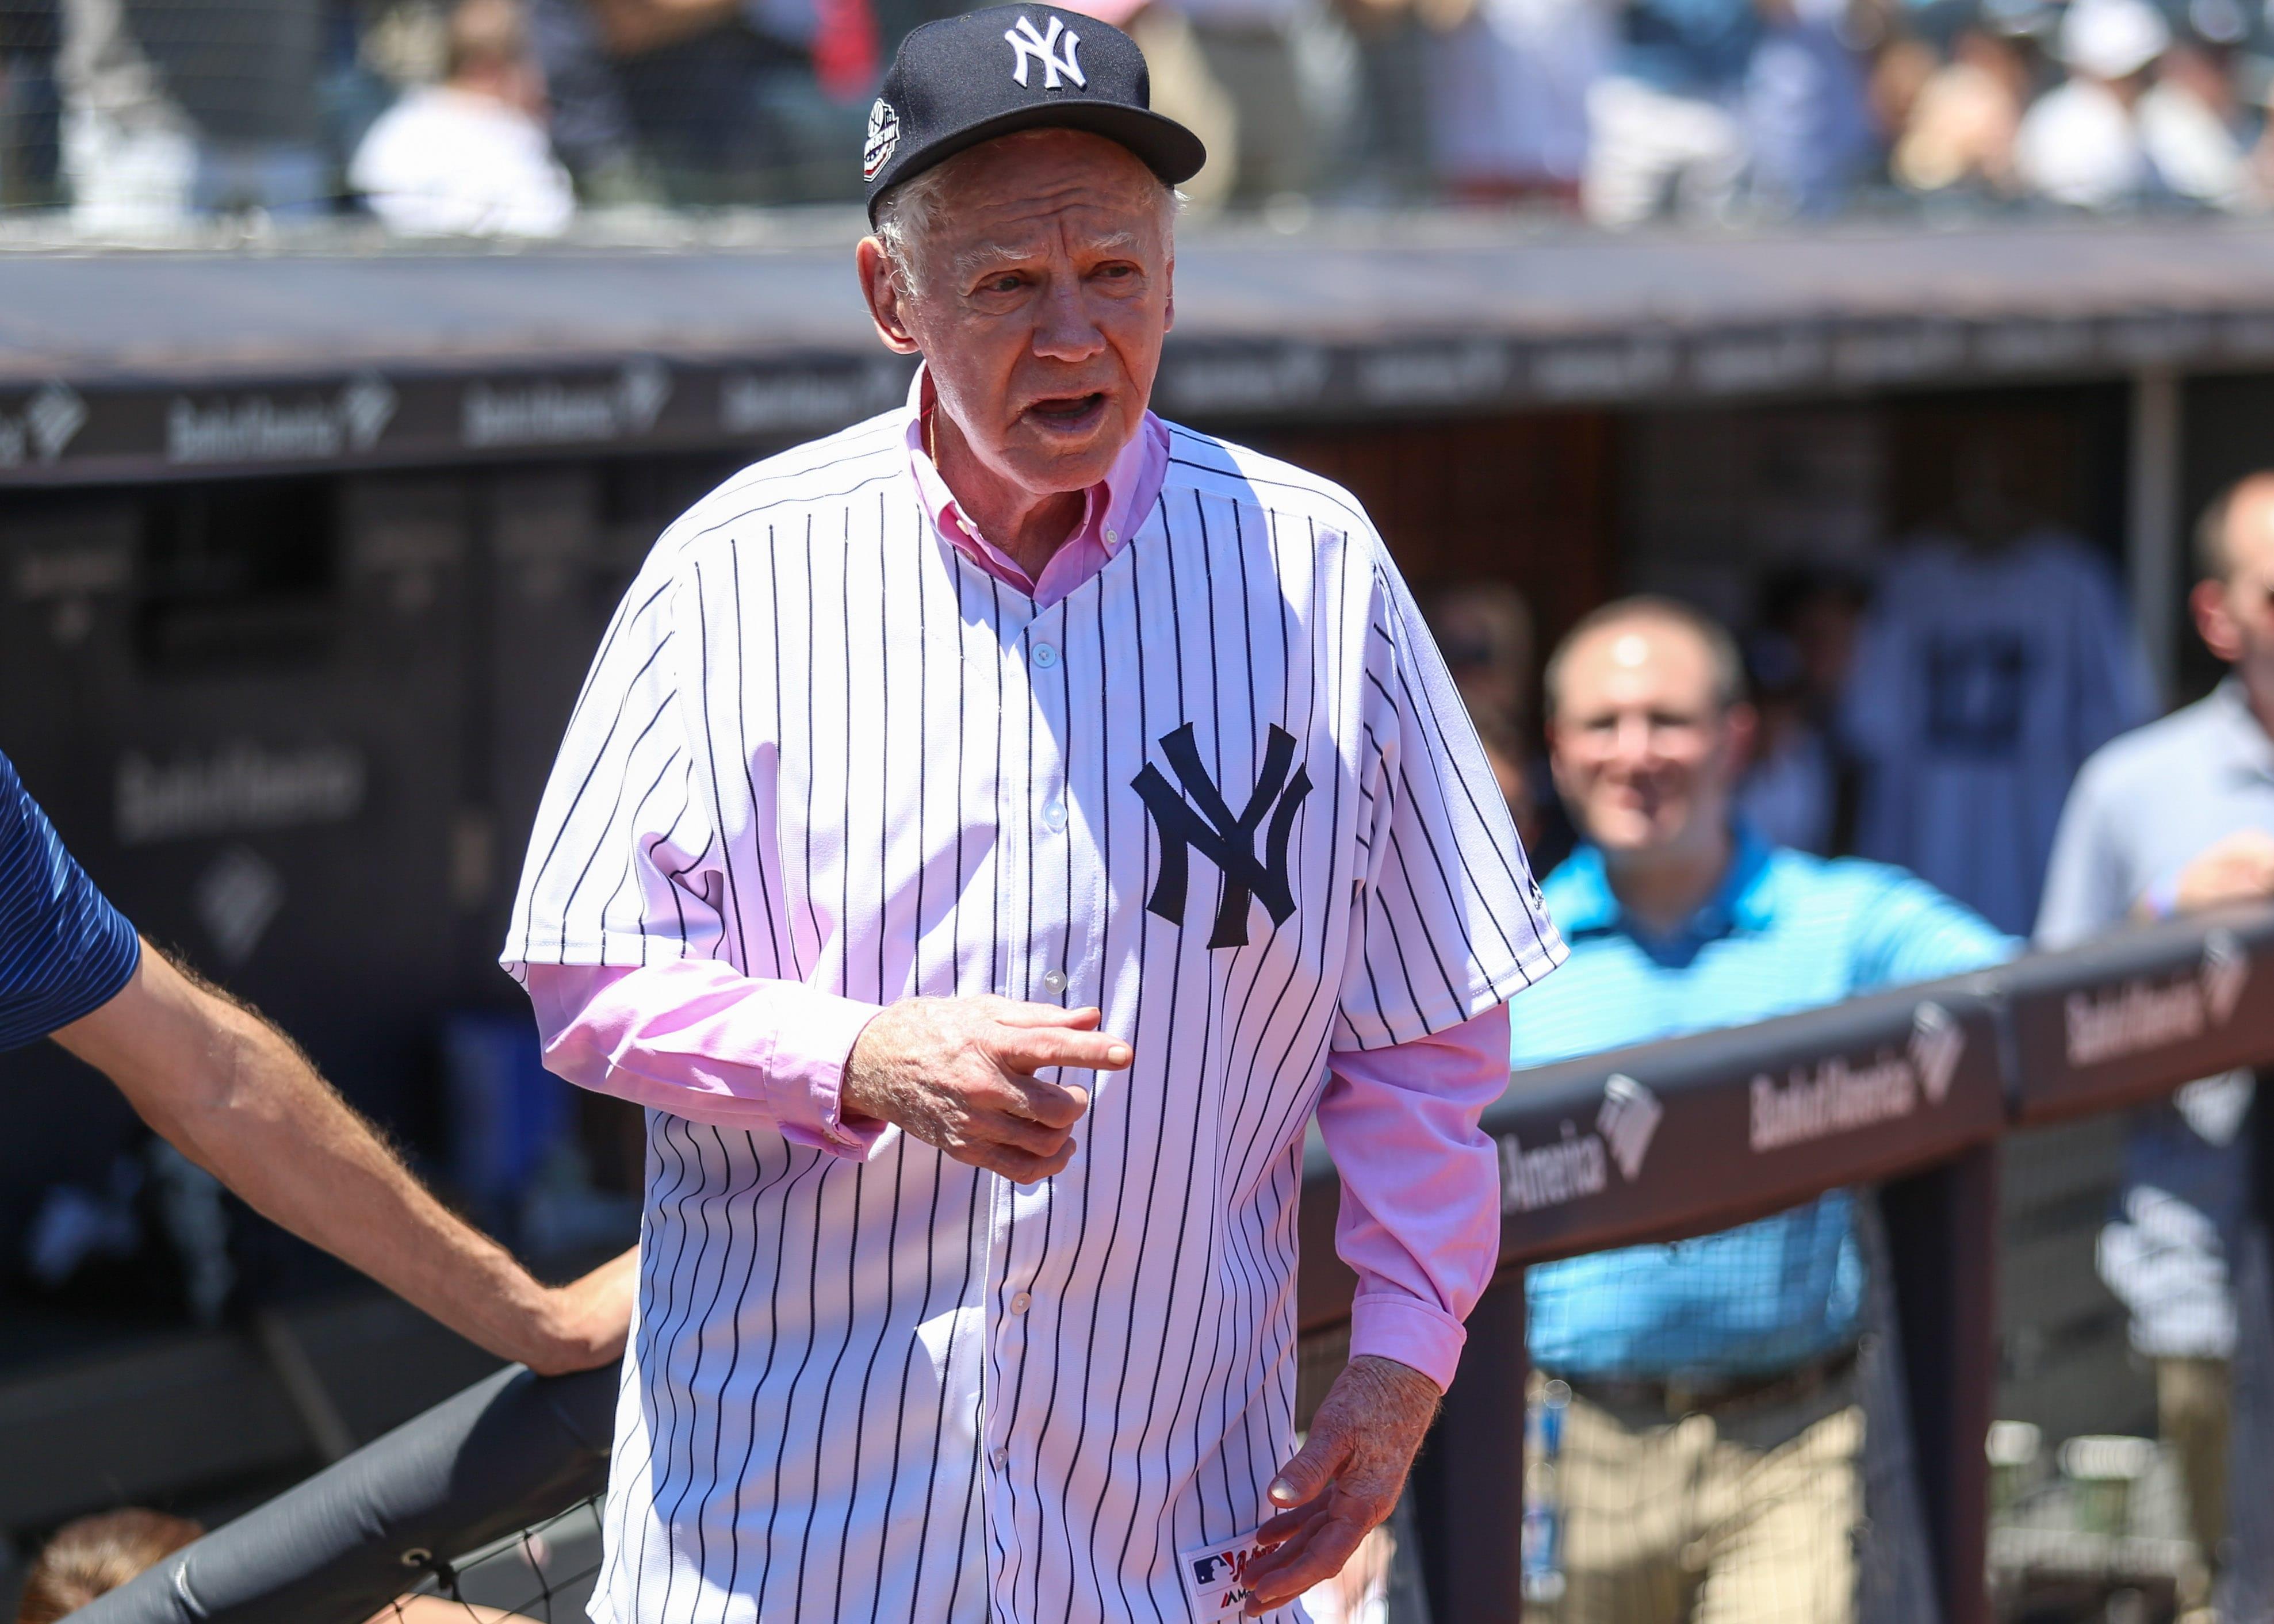 New York Yankees, Whitey Ford